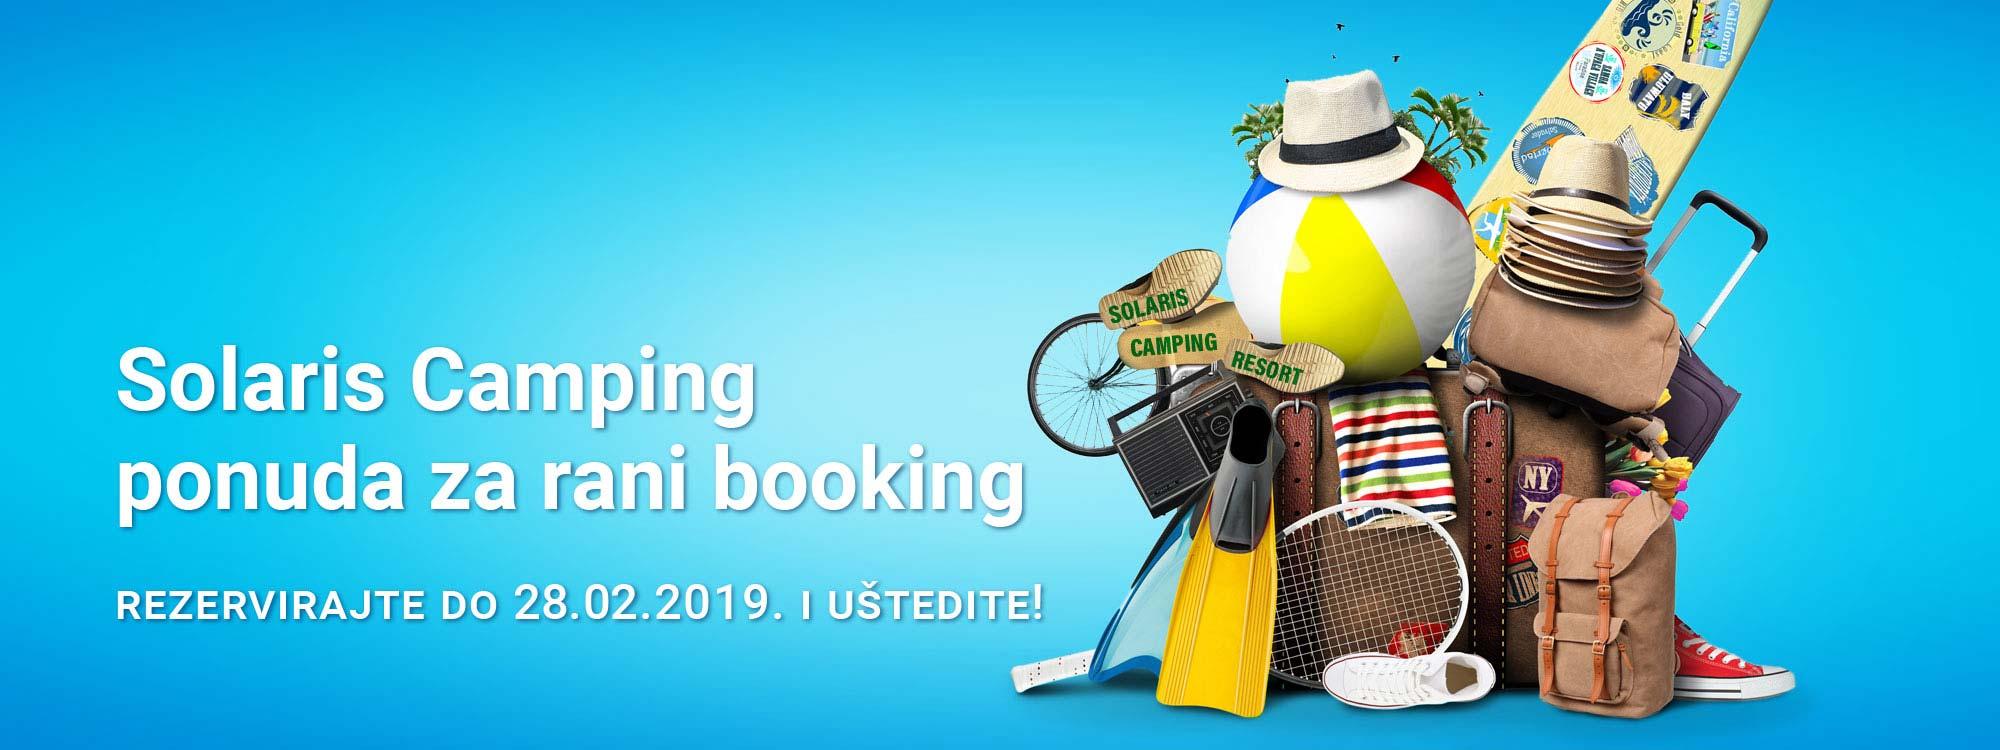 Web-slider-Rani-booking-kamp-2019-02-HRV